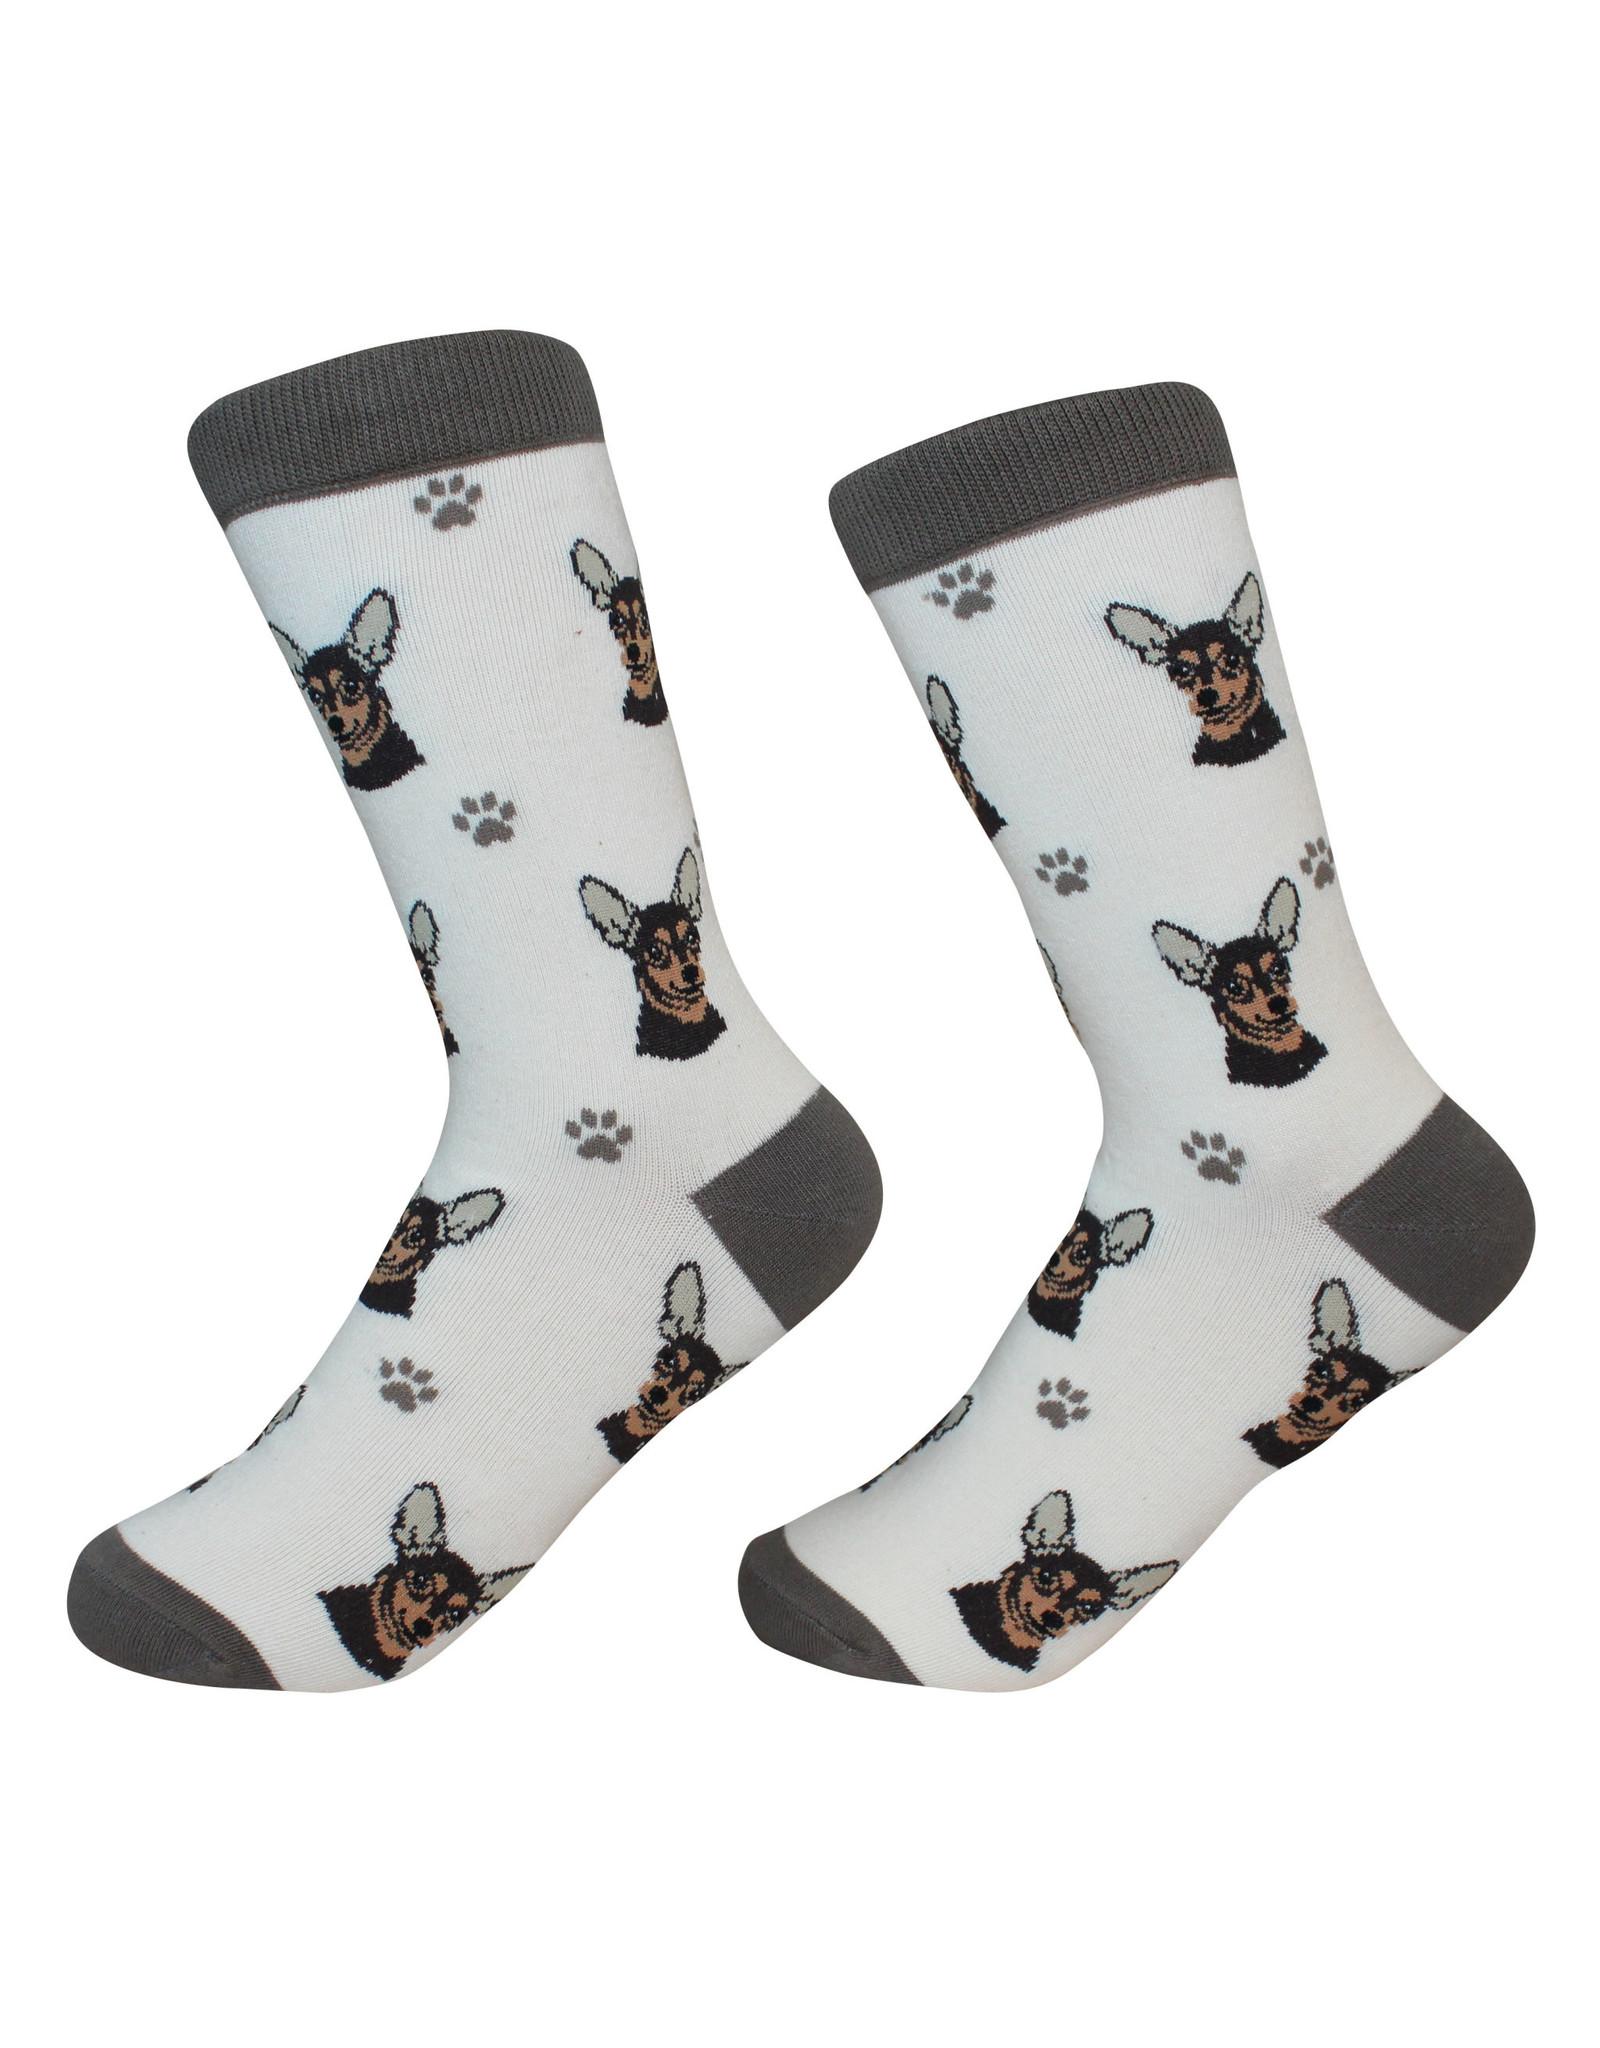 E&S Pets Black Chihuahua Socks